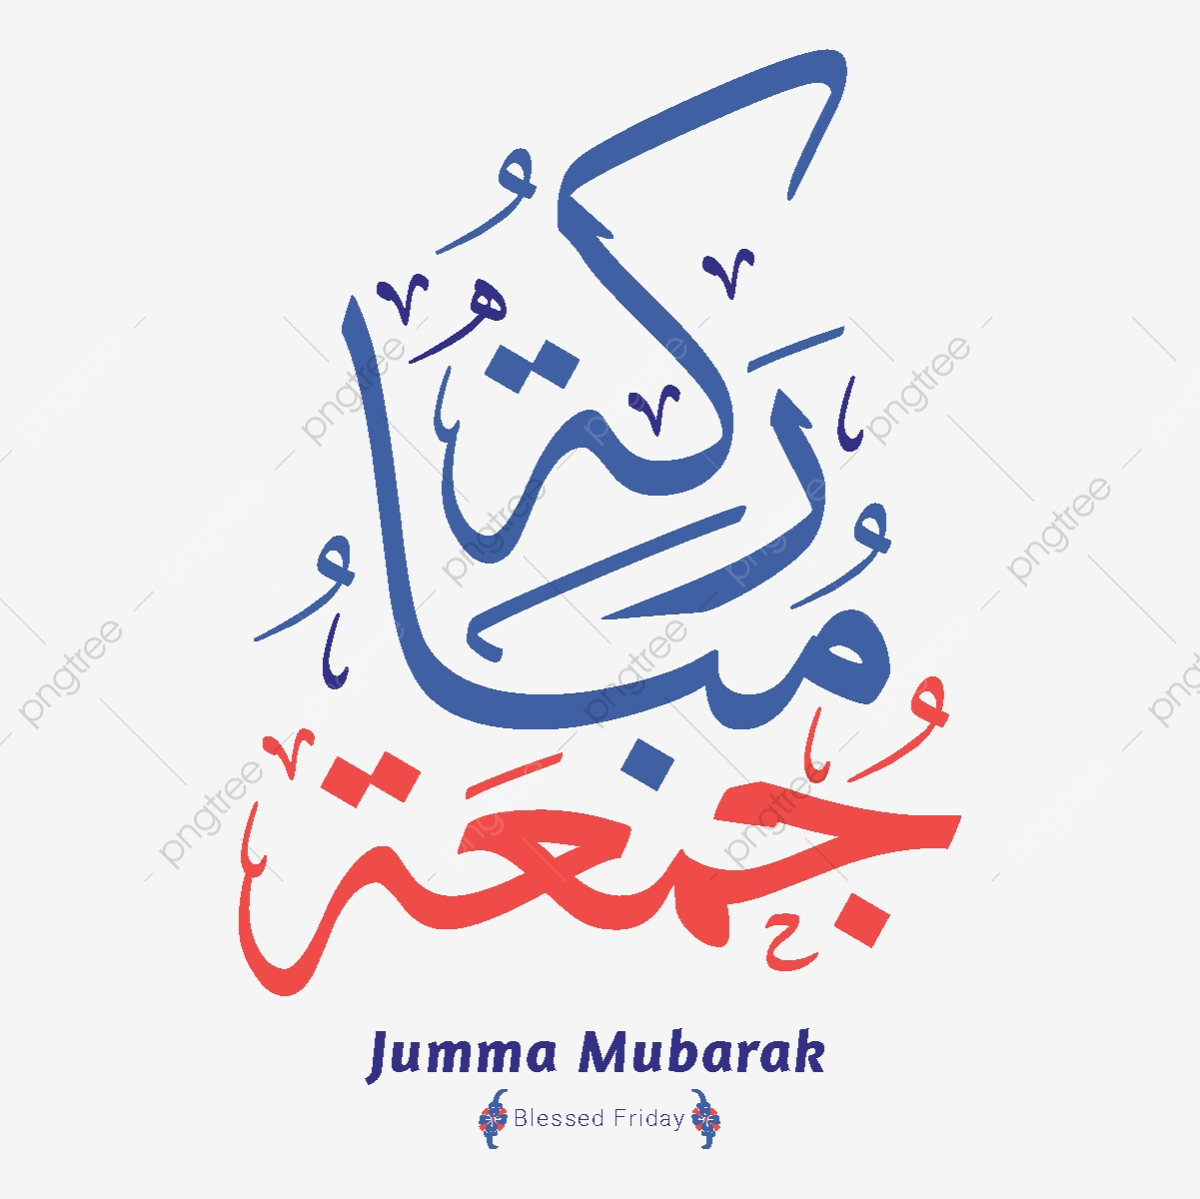 Jumma Mubarak Arabic Calligraphy Islamic Background Islamic